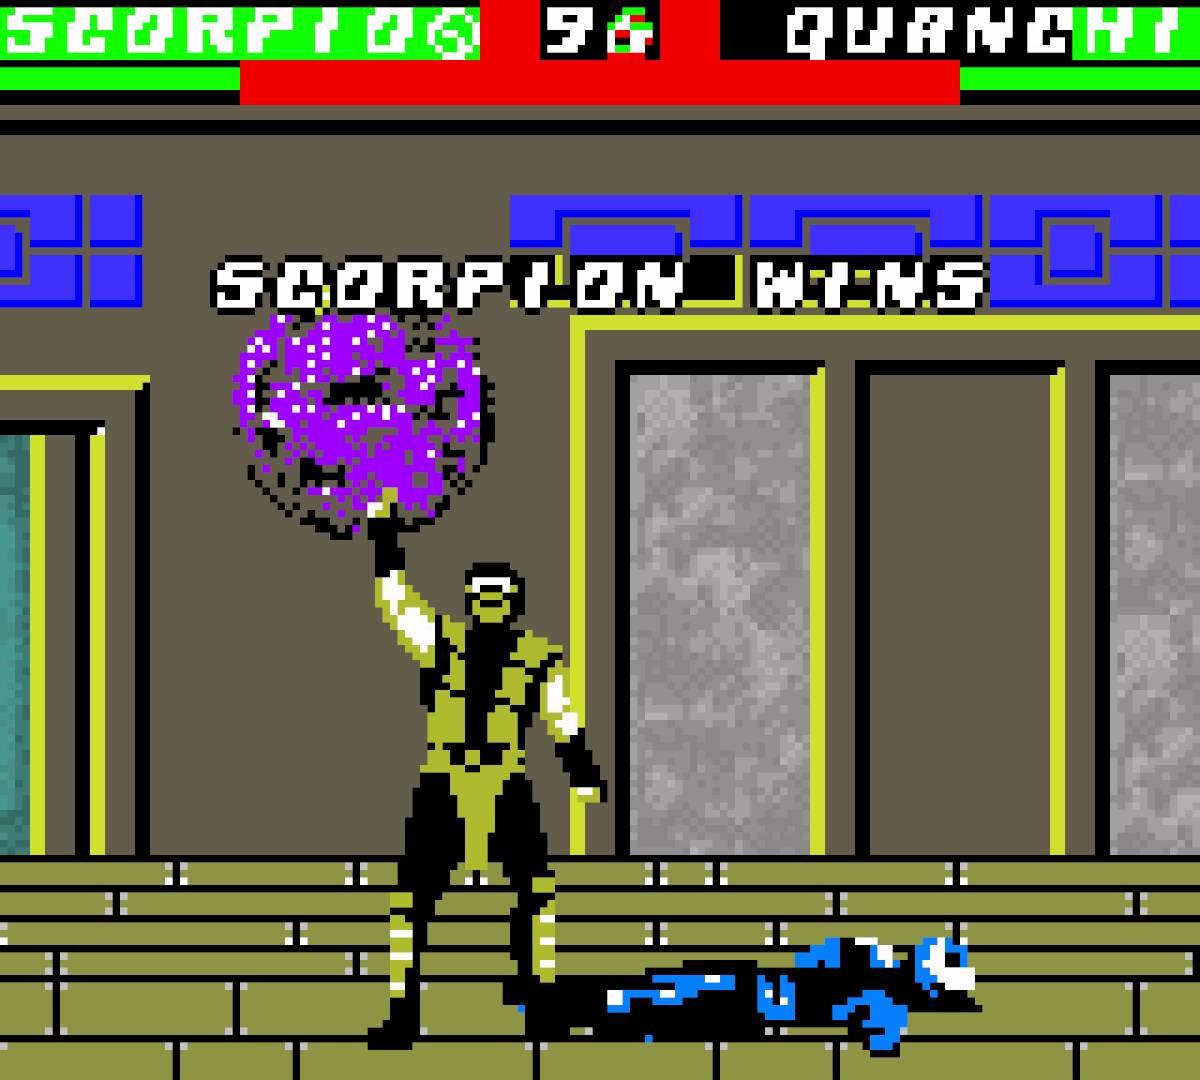 Gameboy color roms for free - Screenshot Thumbnail Media File 3 For Mortal Kombat 4 Usa